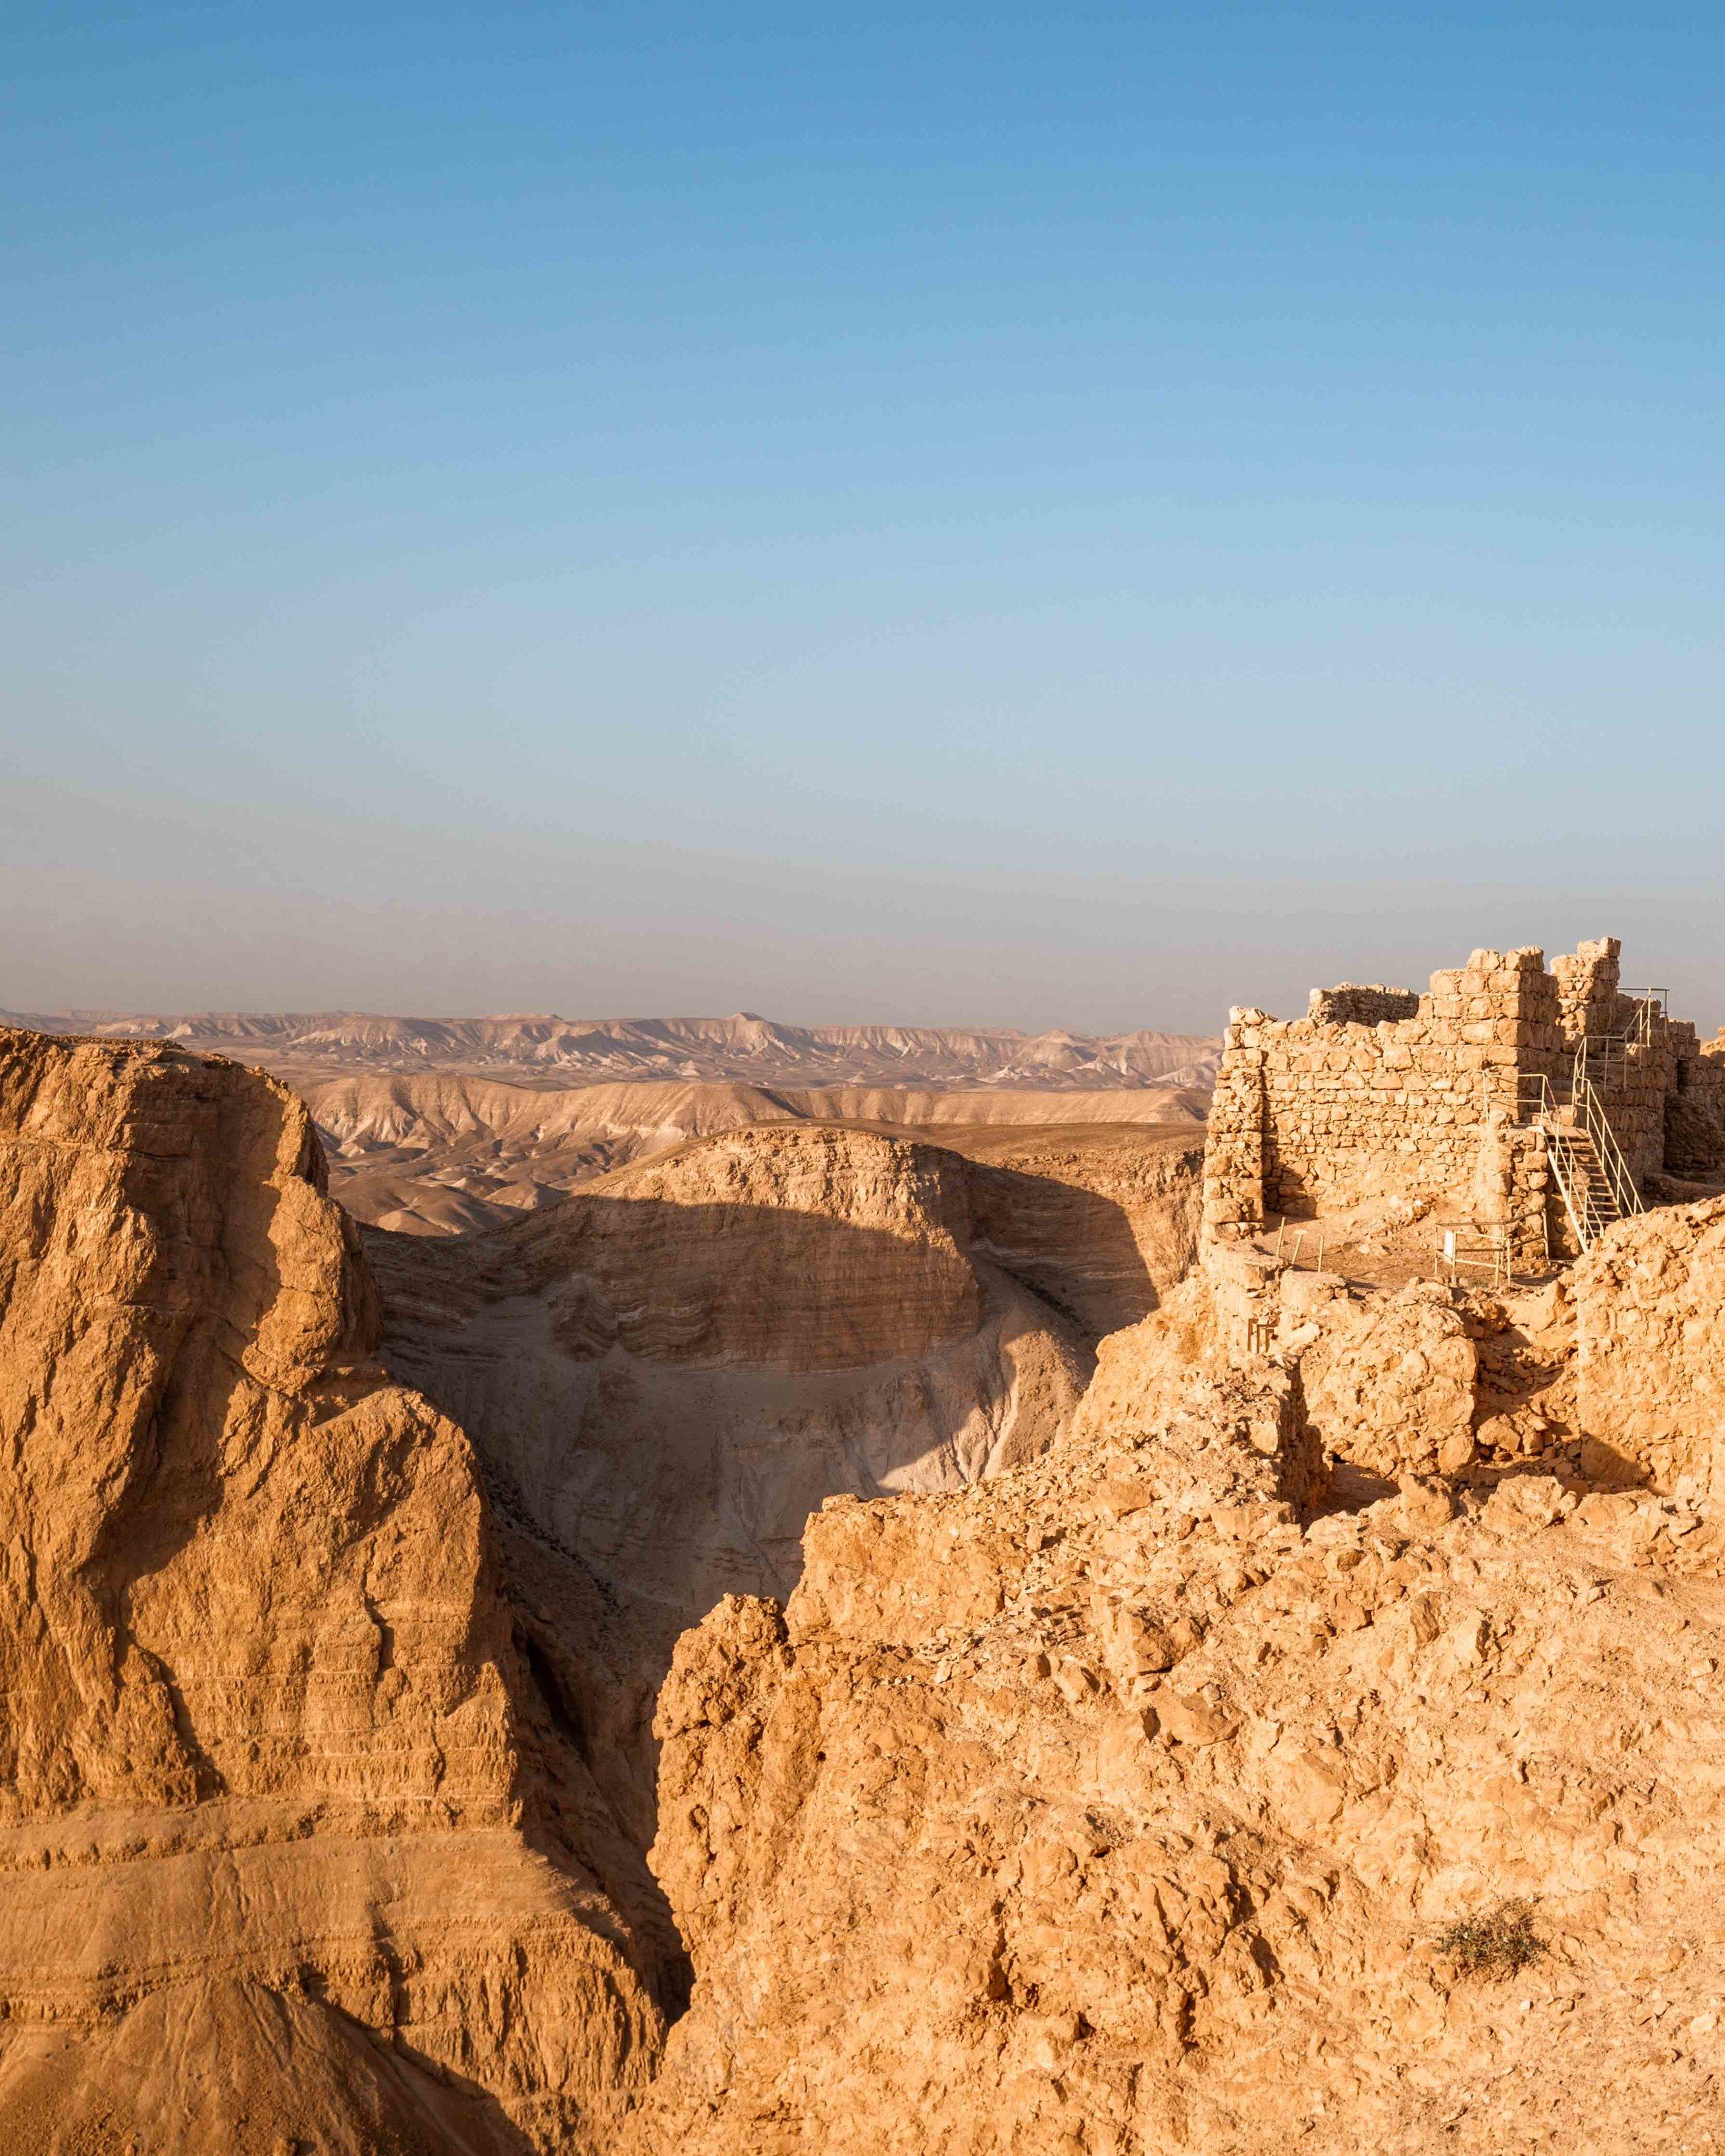 The Masada Fortress at sunrise